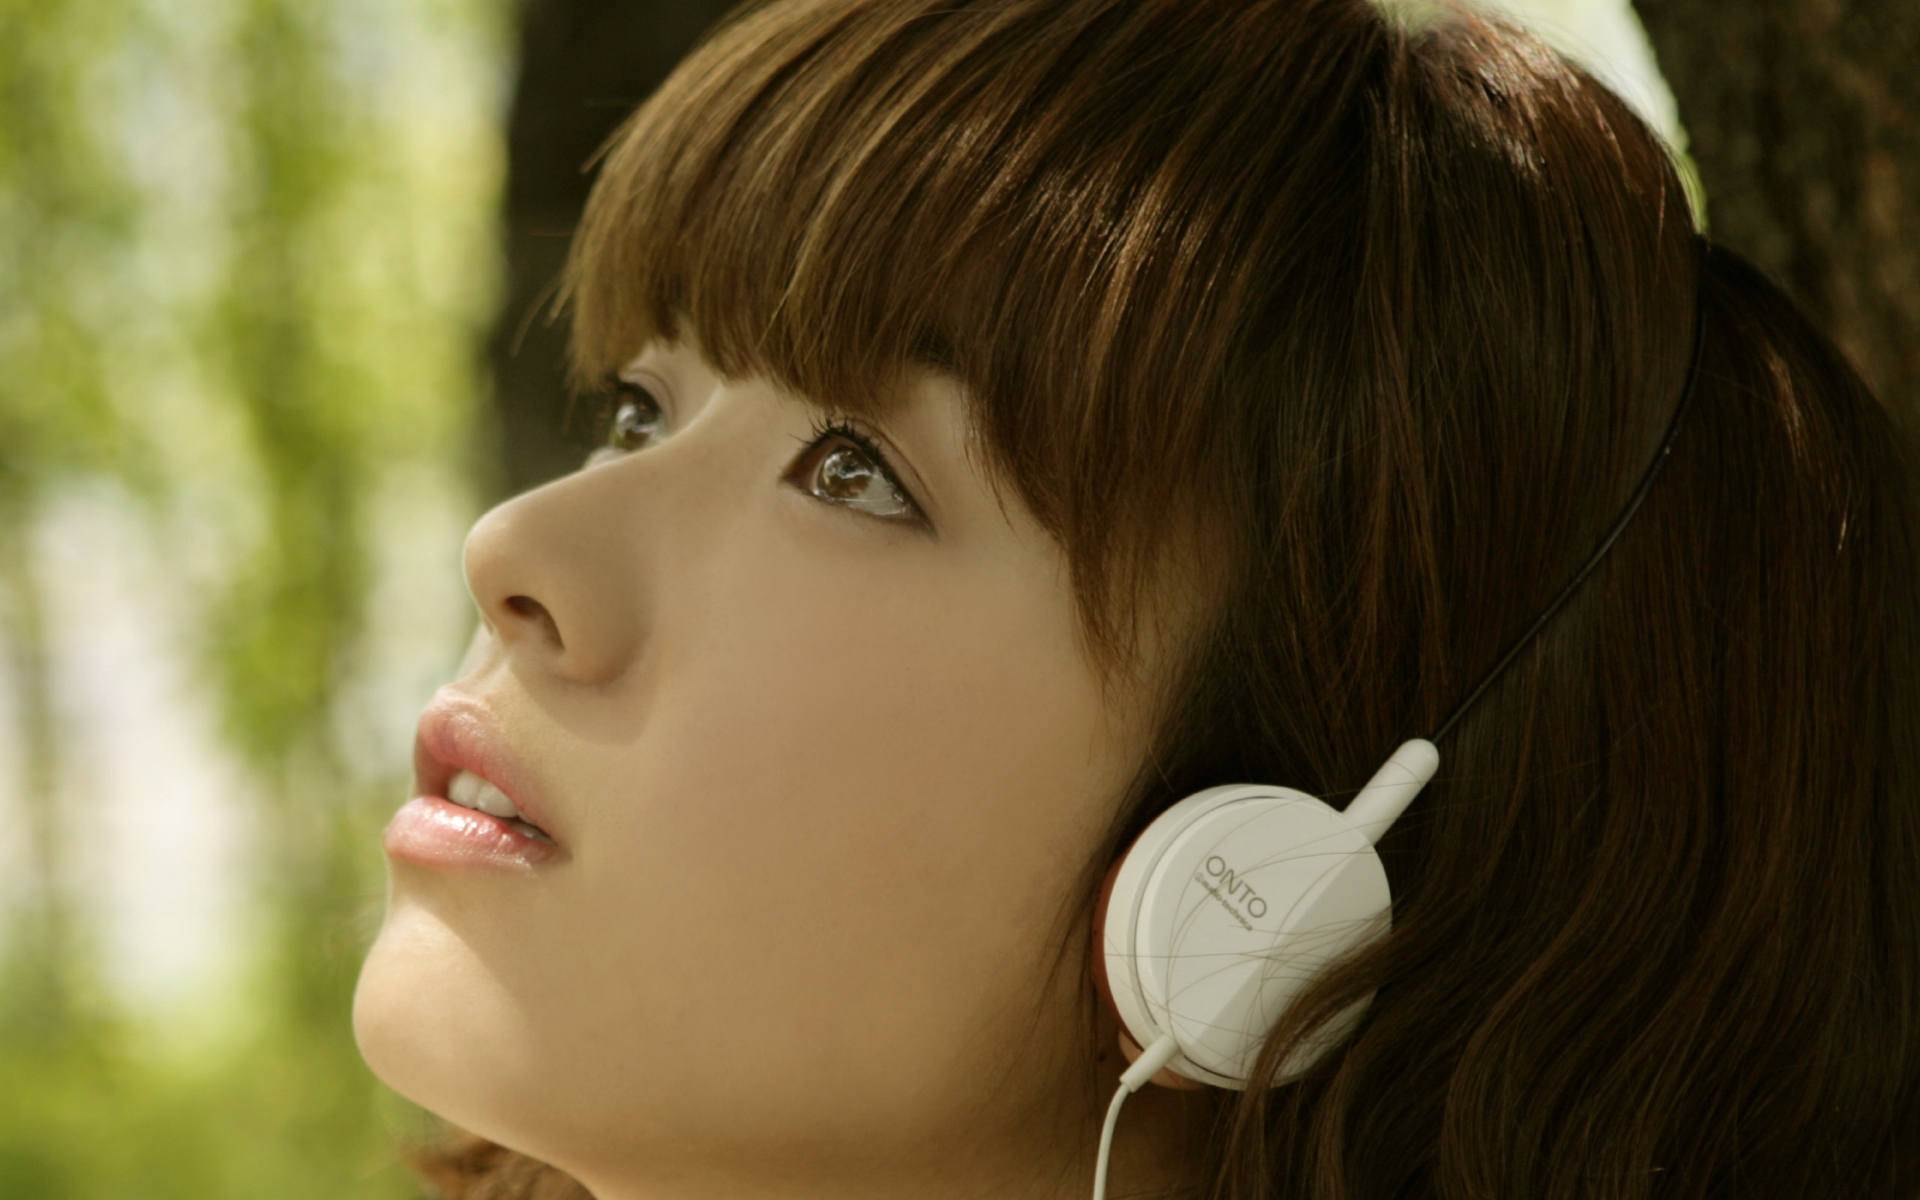 Han Hyo Joo Images